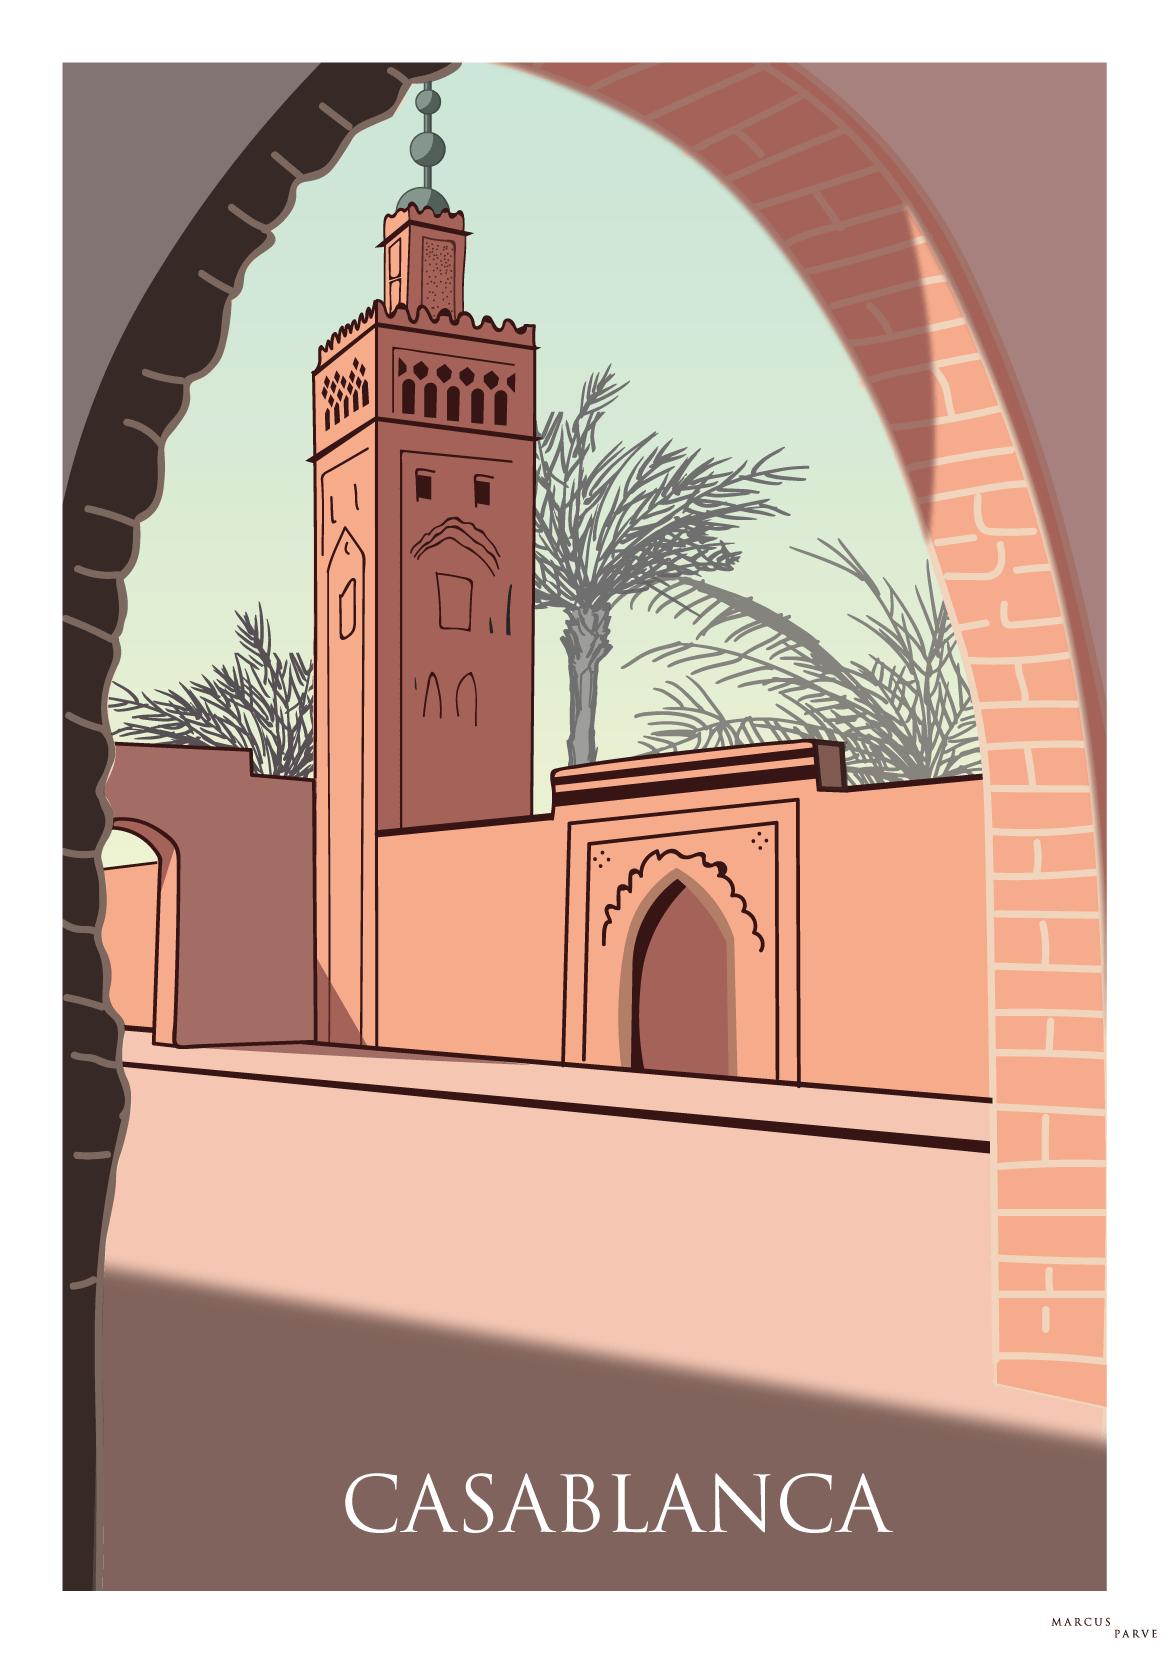 Vintage Casablanca poster. Poster for lovers of Casablanca